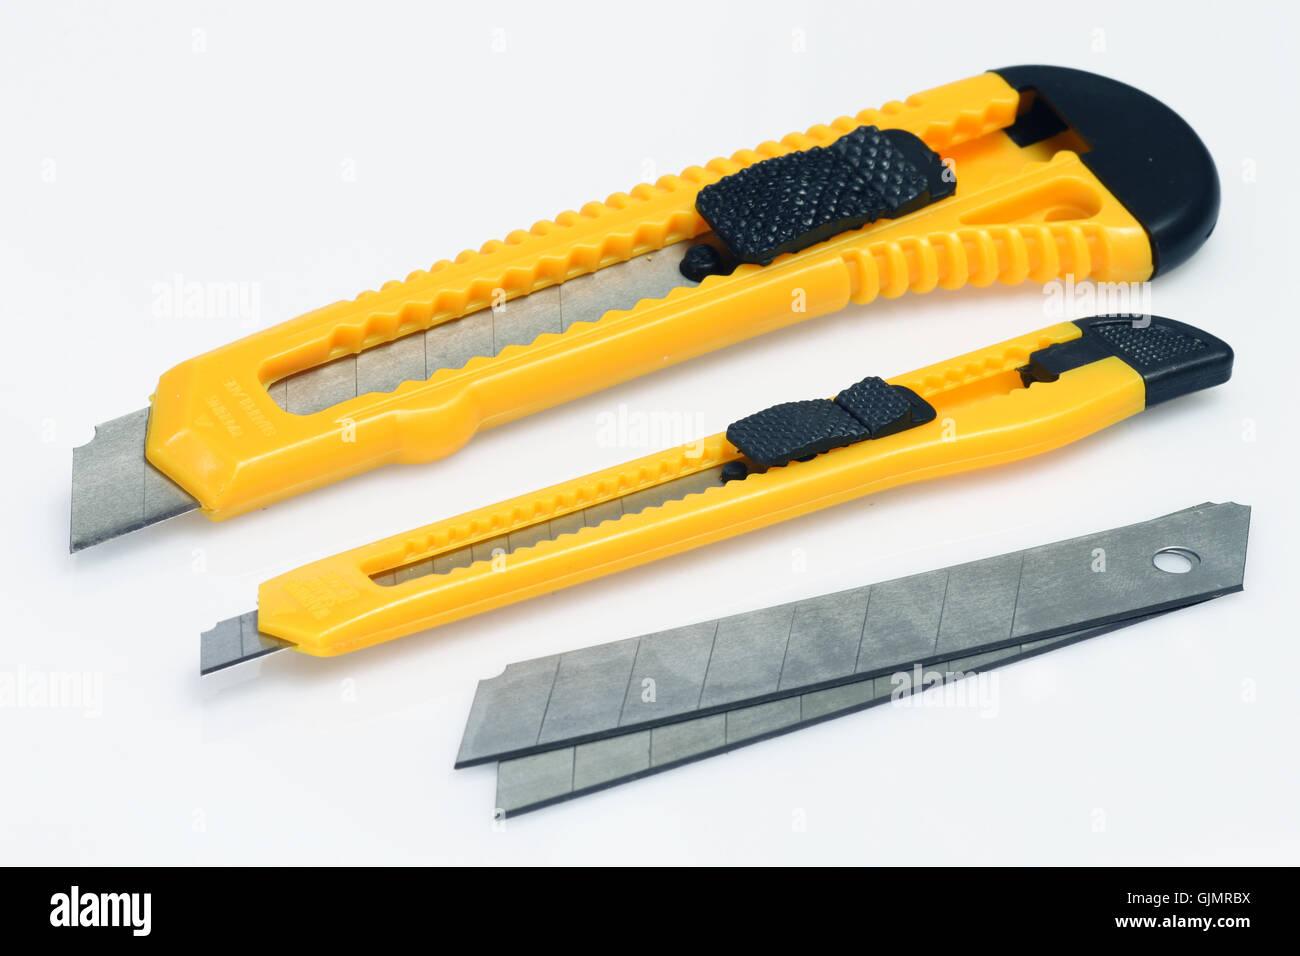 cutting tool tool blade - Stock Image